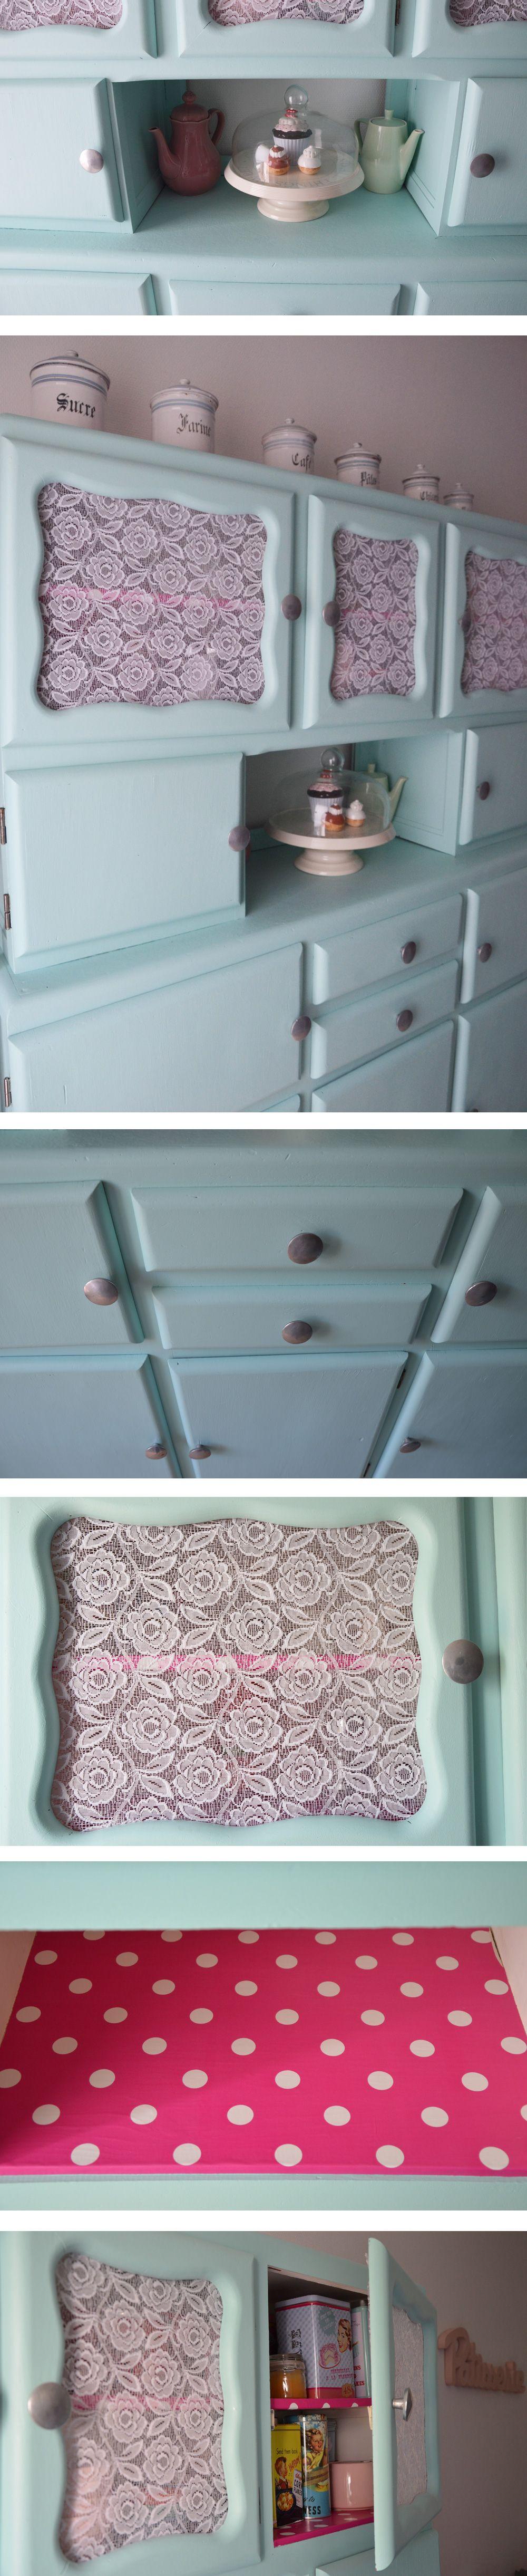 diy relooking de mon buffet vintage des ann es 50 meuble vintage bricolage mill sime des. Black Bedroom Furniture Sets. Home Design Ideas